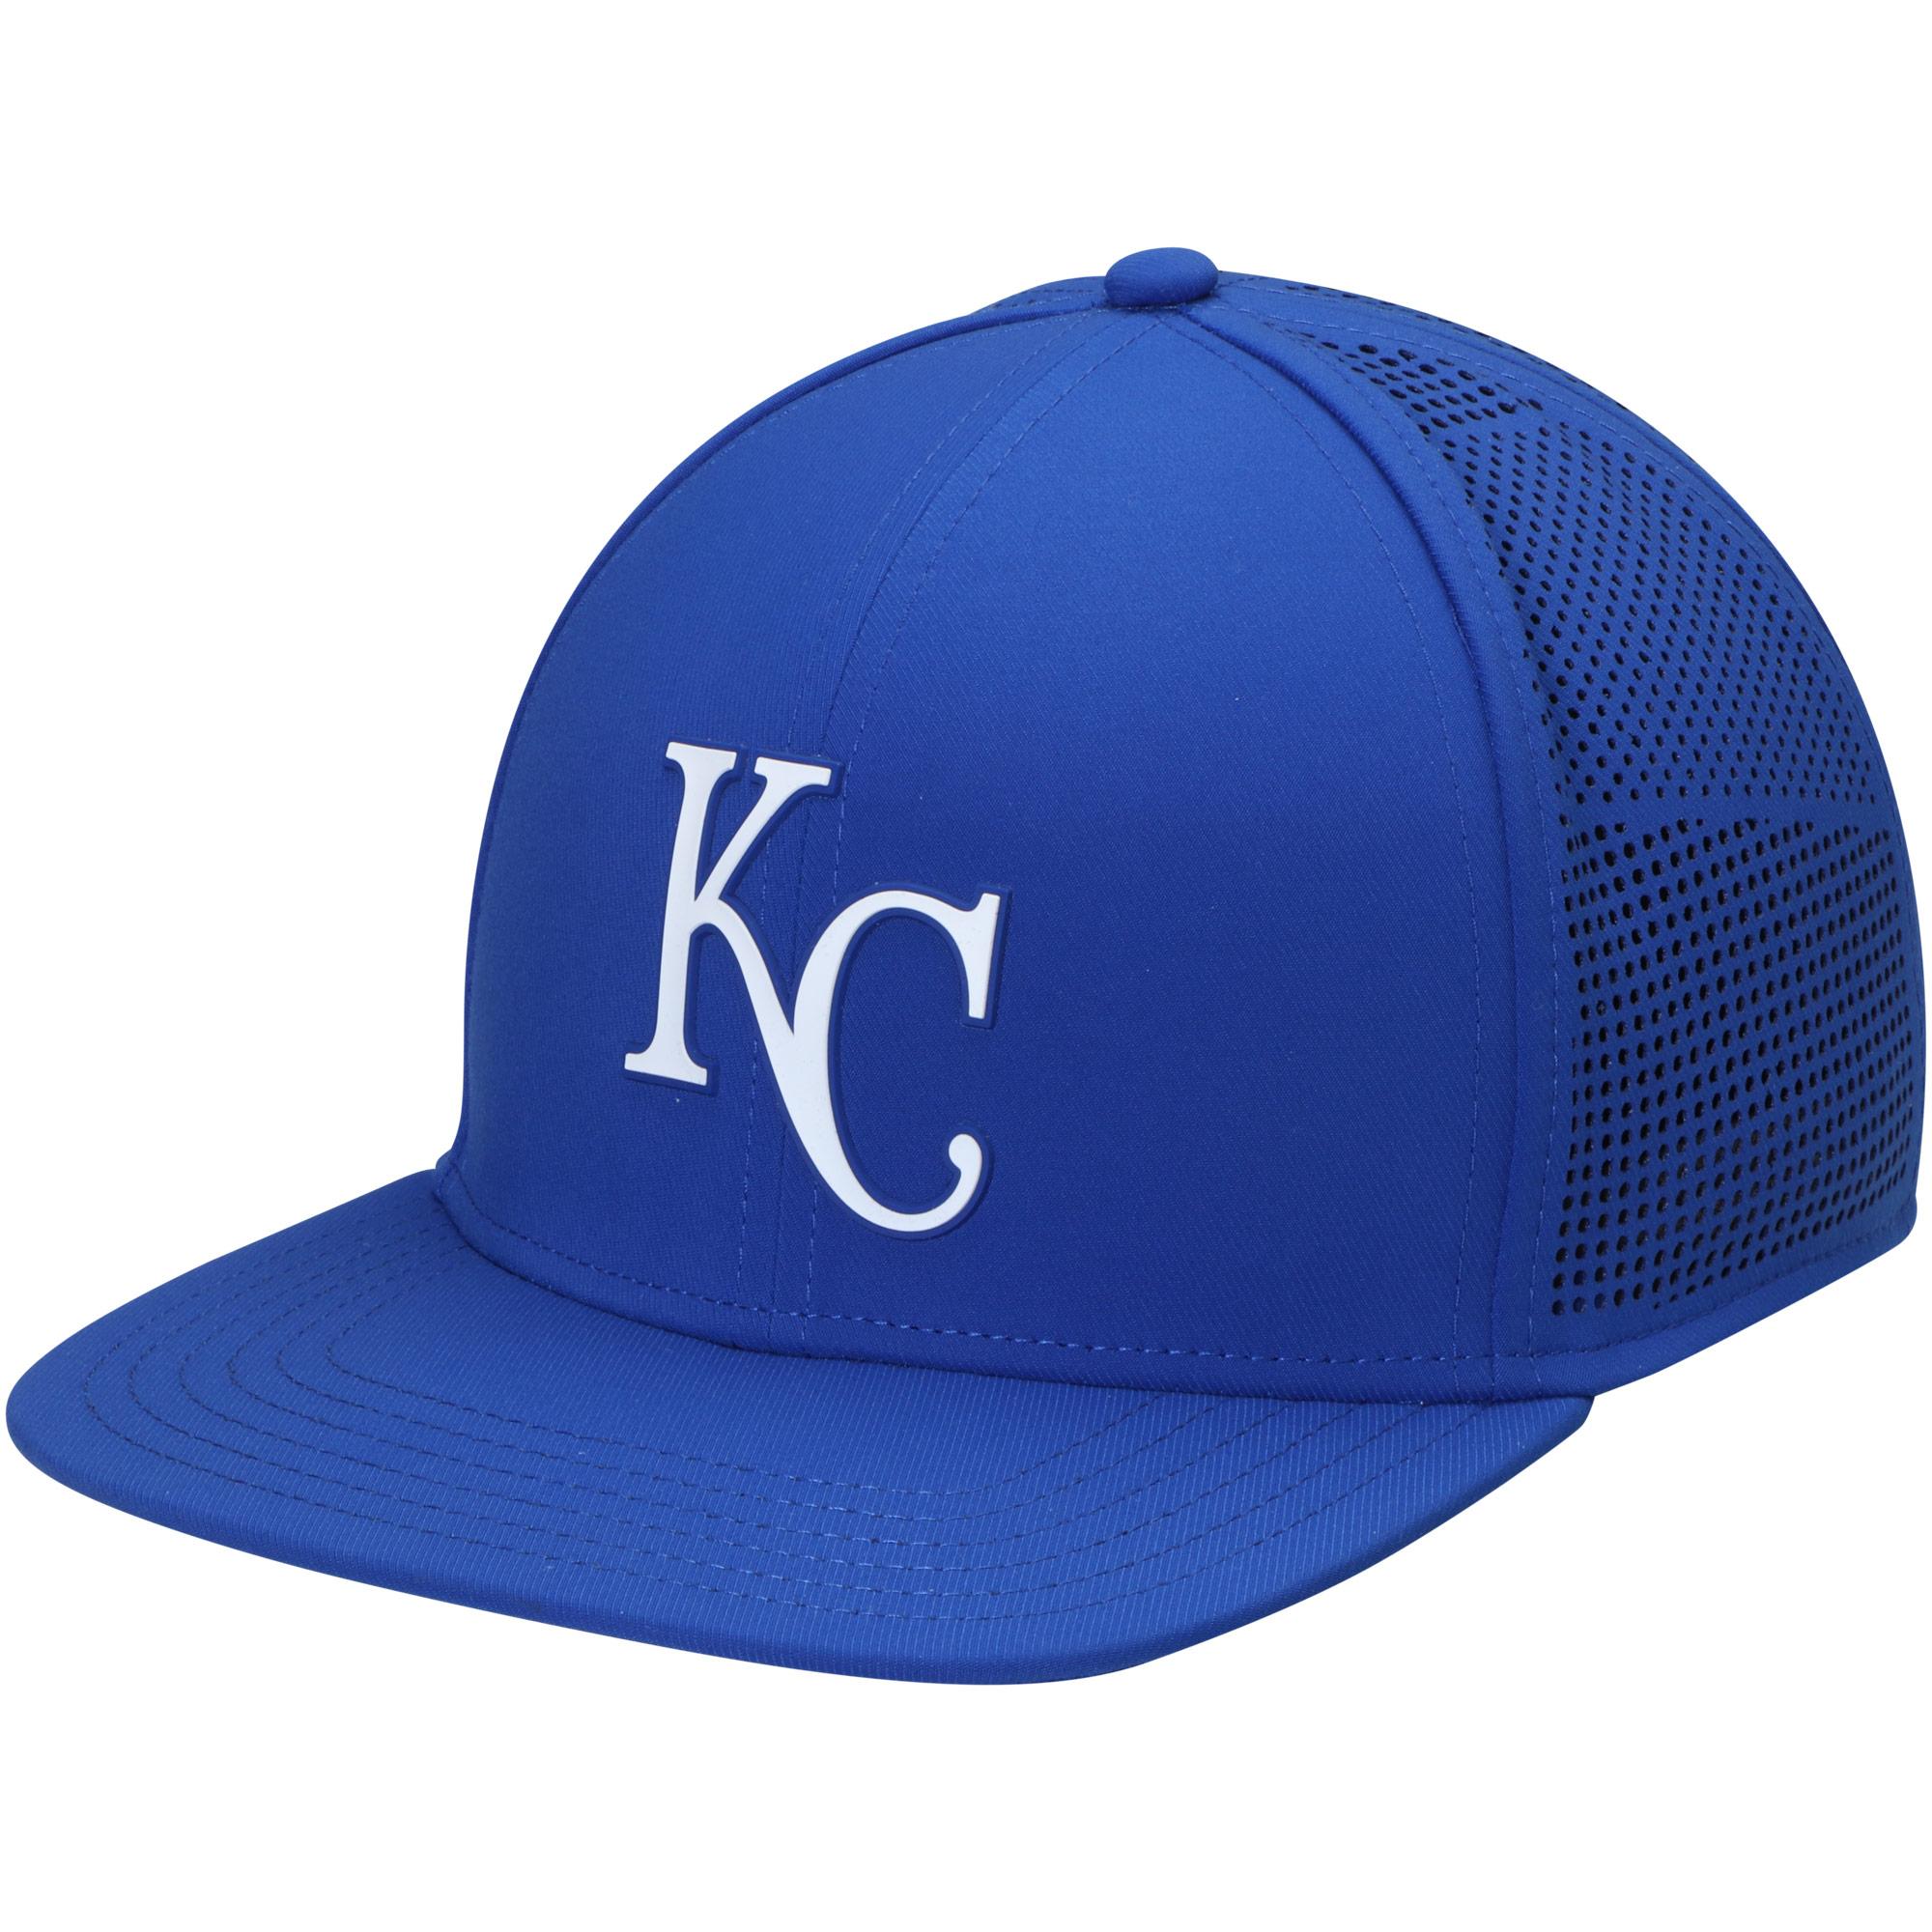 Kansas City Royals Under Armour Supervent Snapback Adjustable Hat - Royal - OSFA